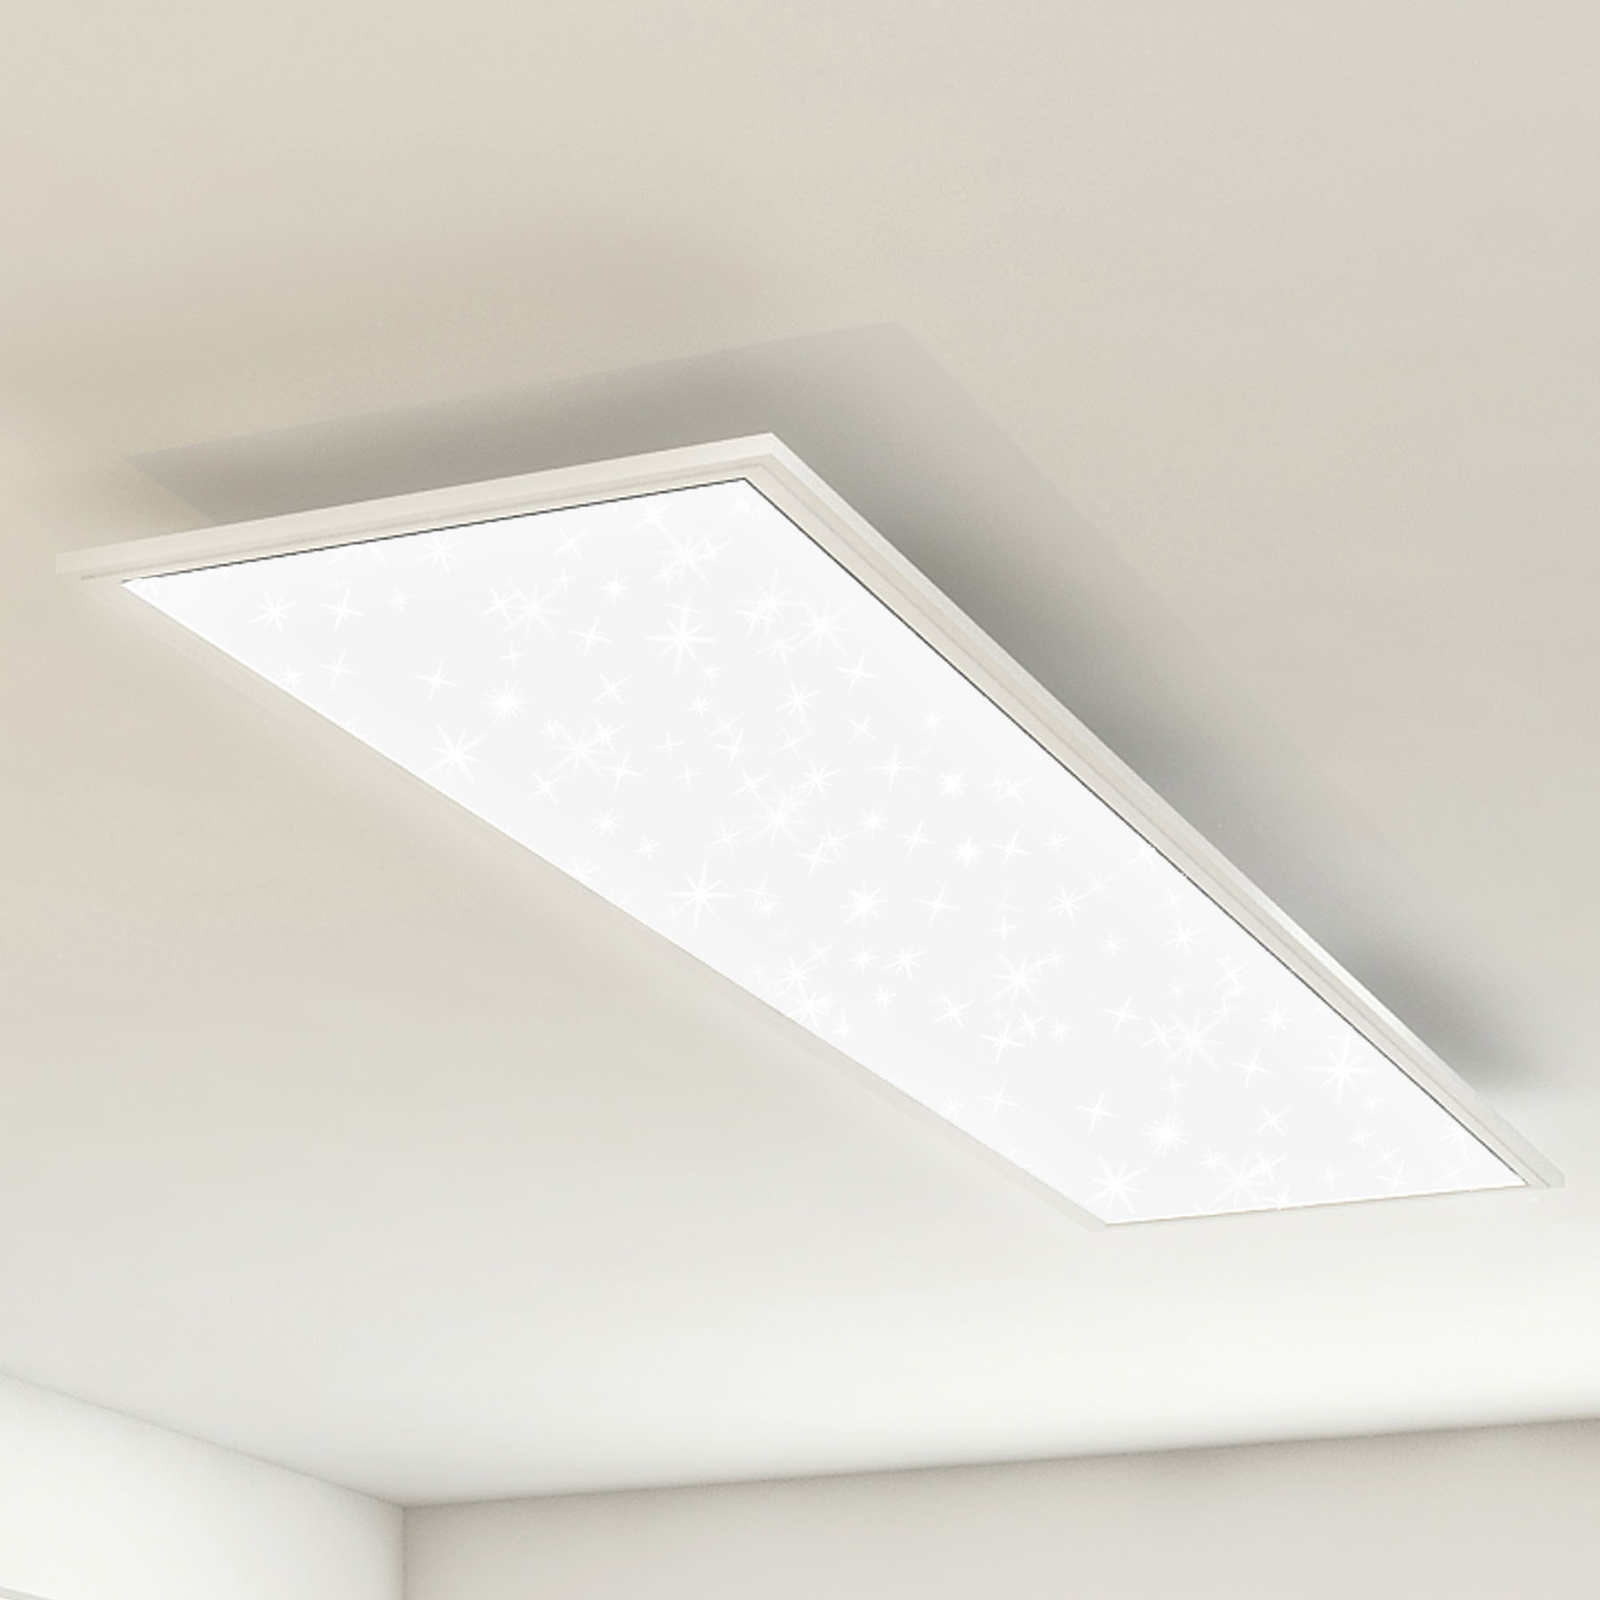 LED-Panel Sternenhimmel 7393, 119 x 29 cm